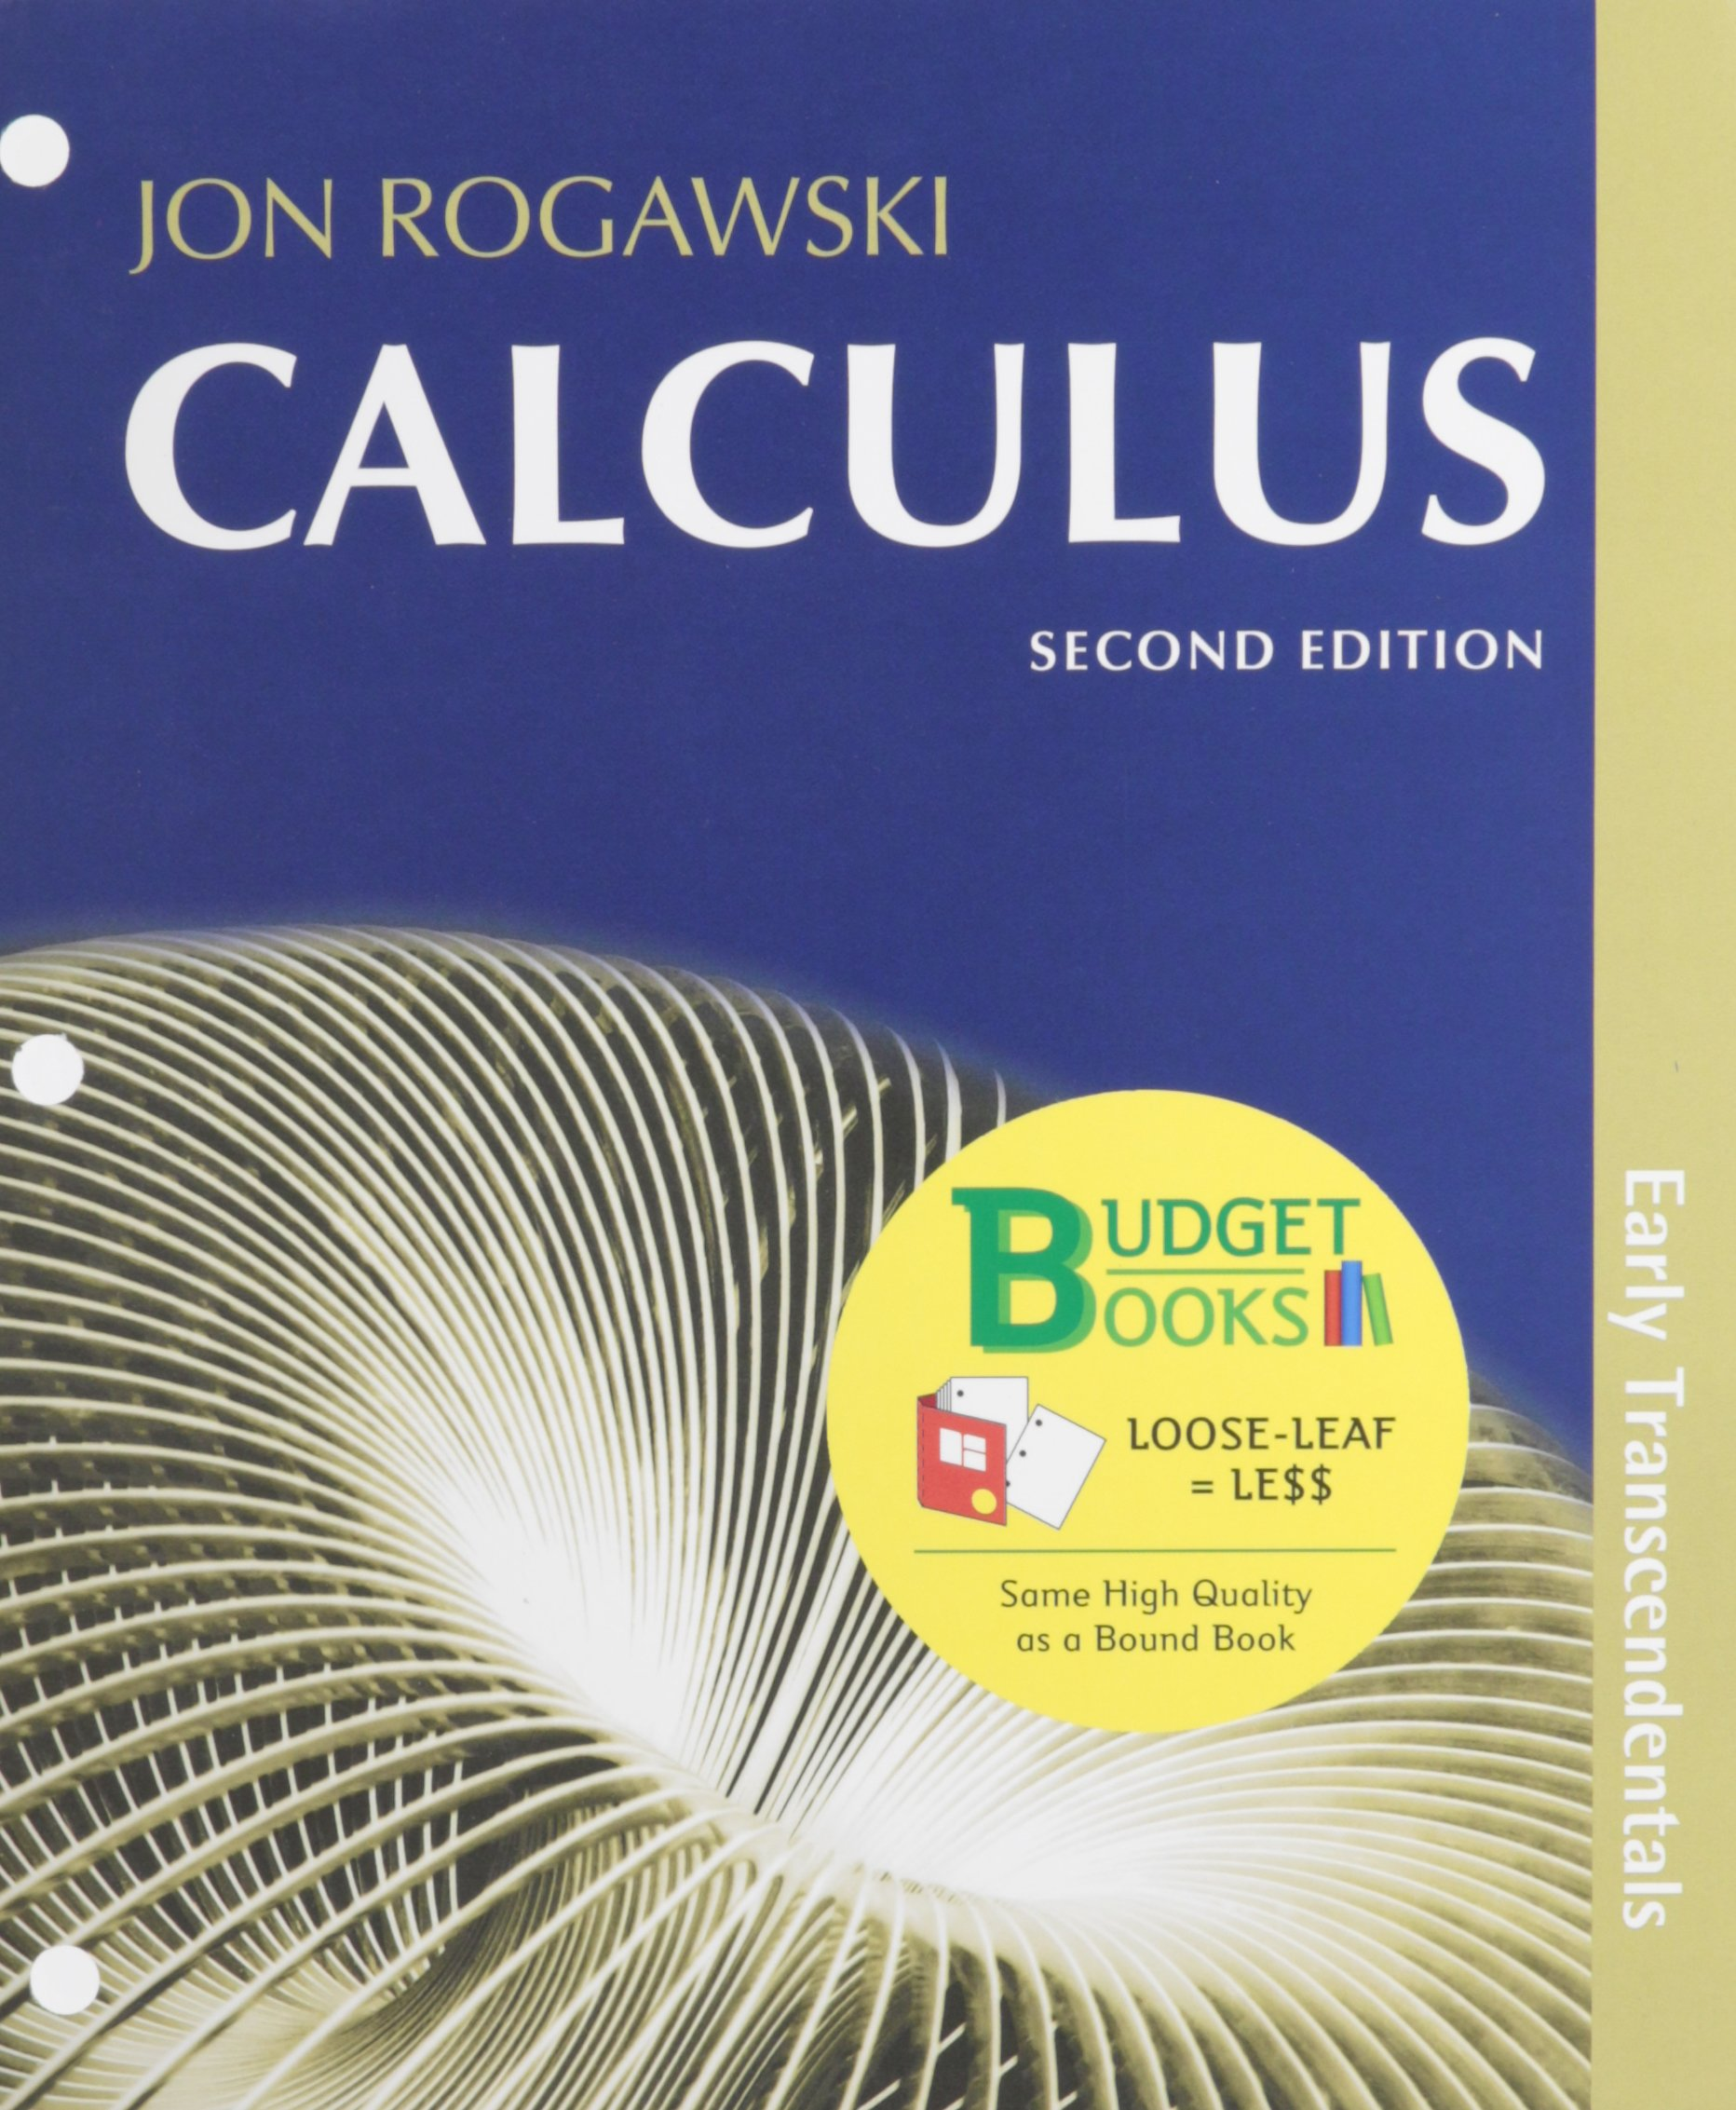 Calculus: Early Transcendentals: Jonathan David Rogawski: 9781429260169:  Books - Amazon.ca